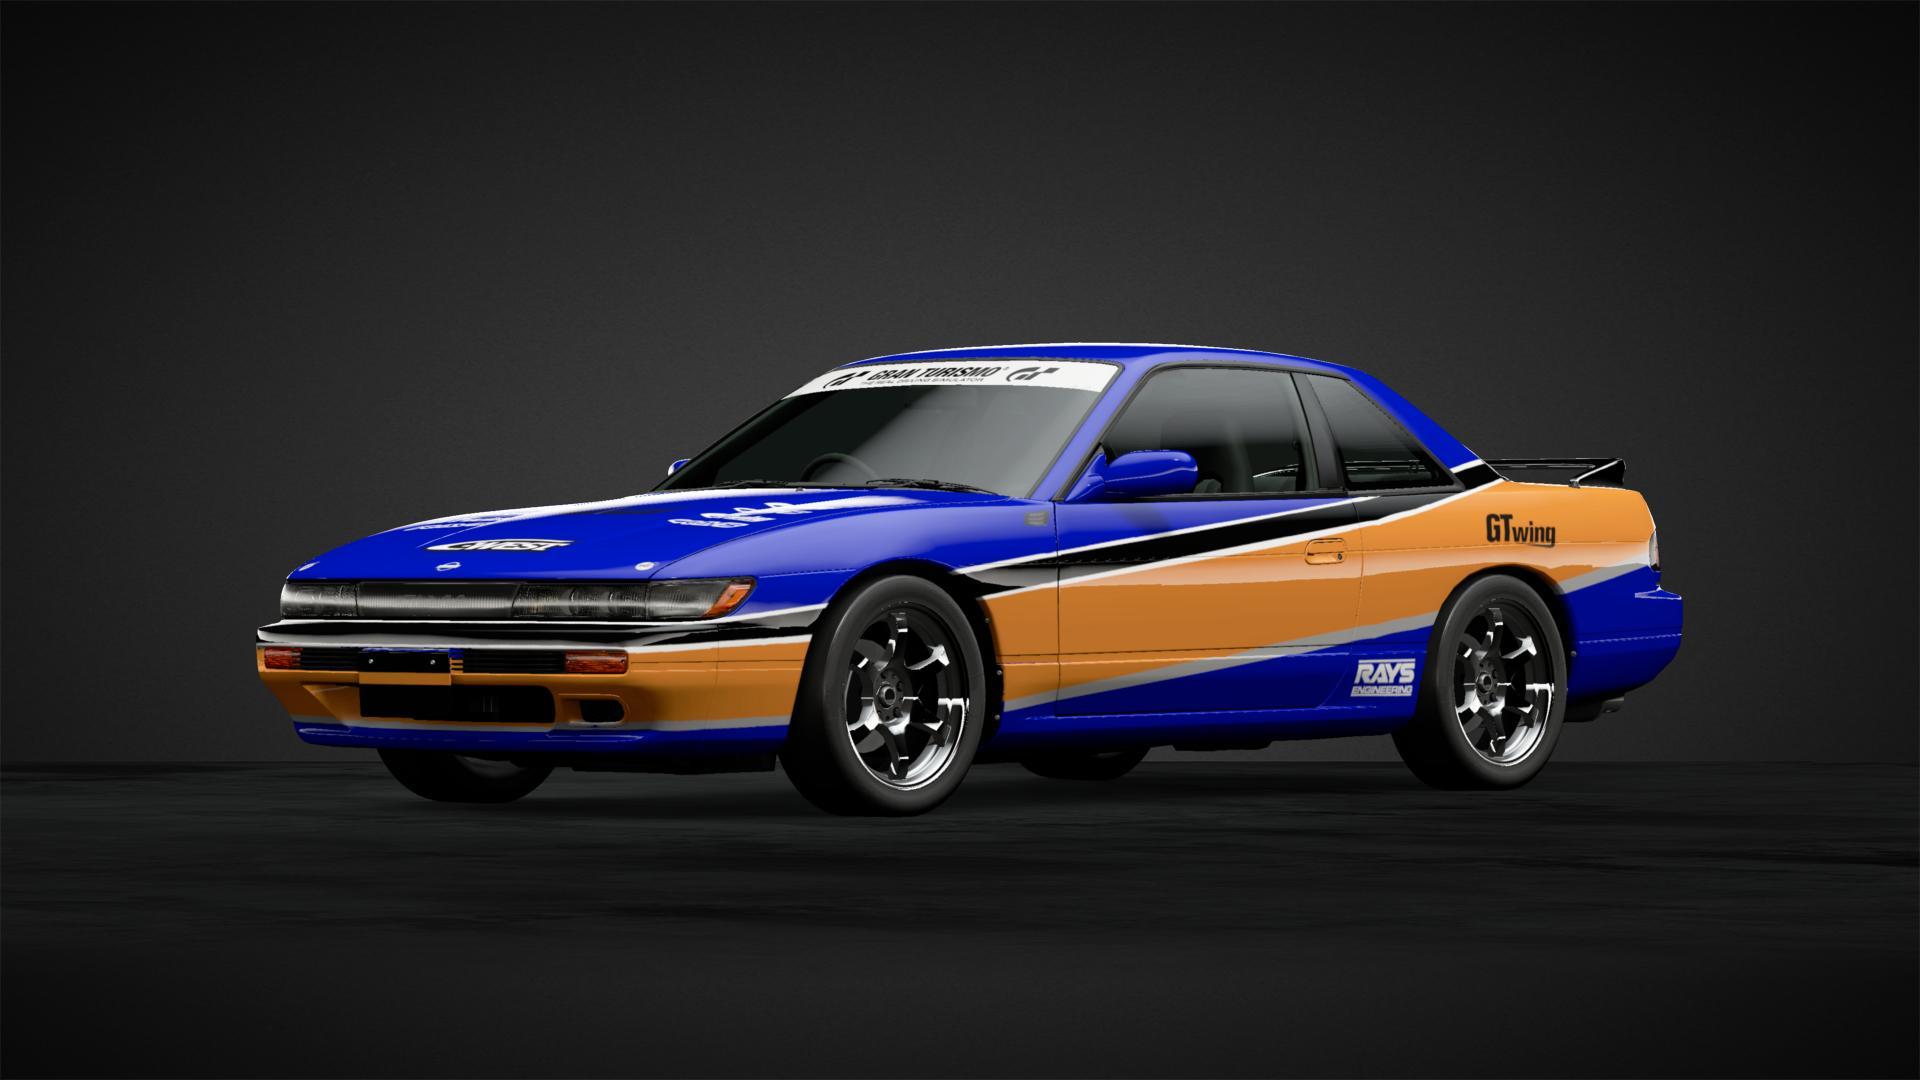 Hans Monalisa 240sx Silvia S15 Car Livery By Johnnyb7531 Community Gran Turismo Sport